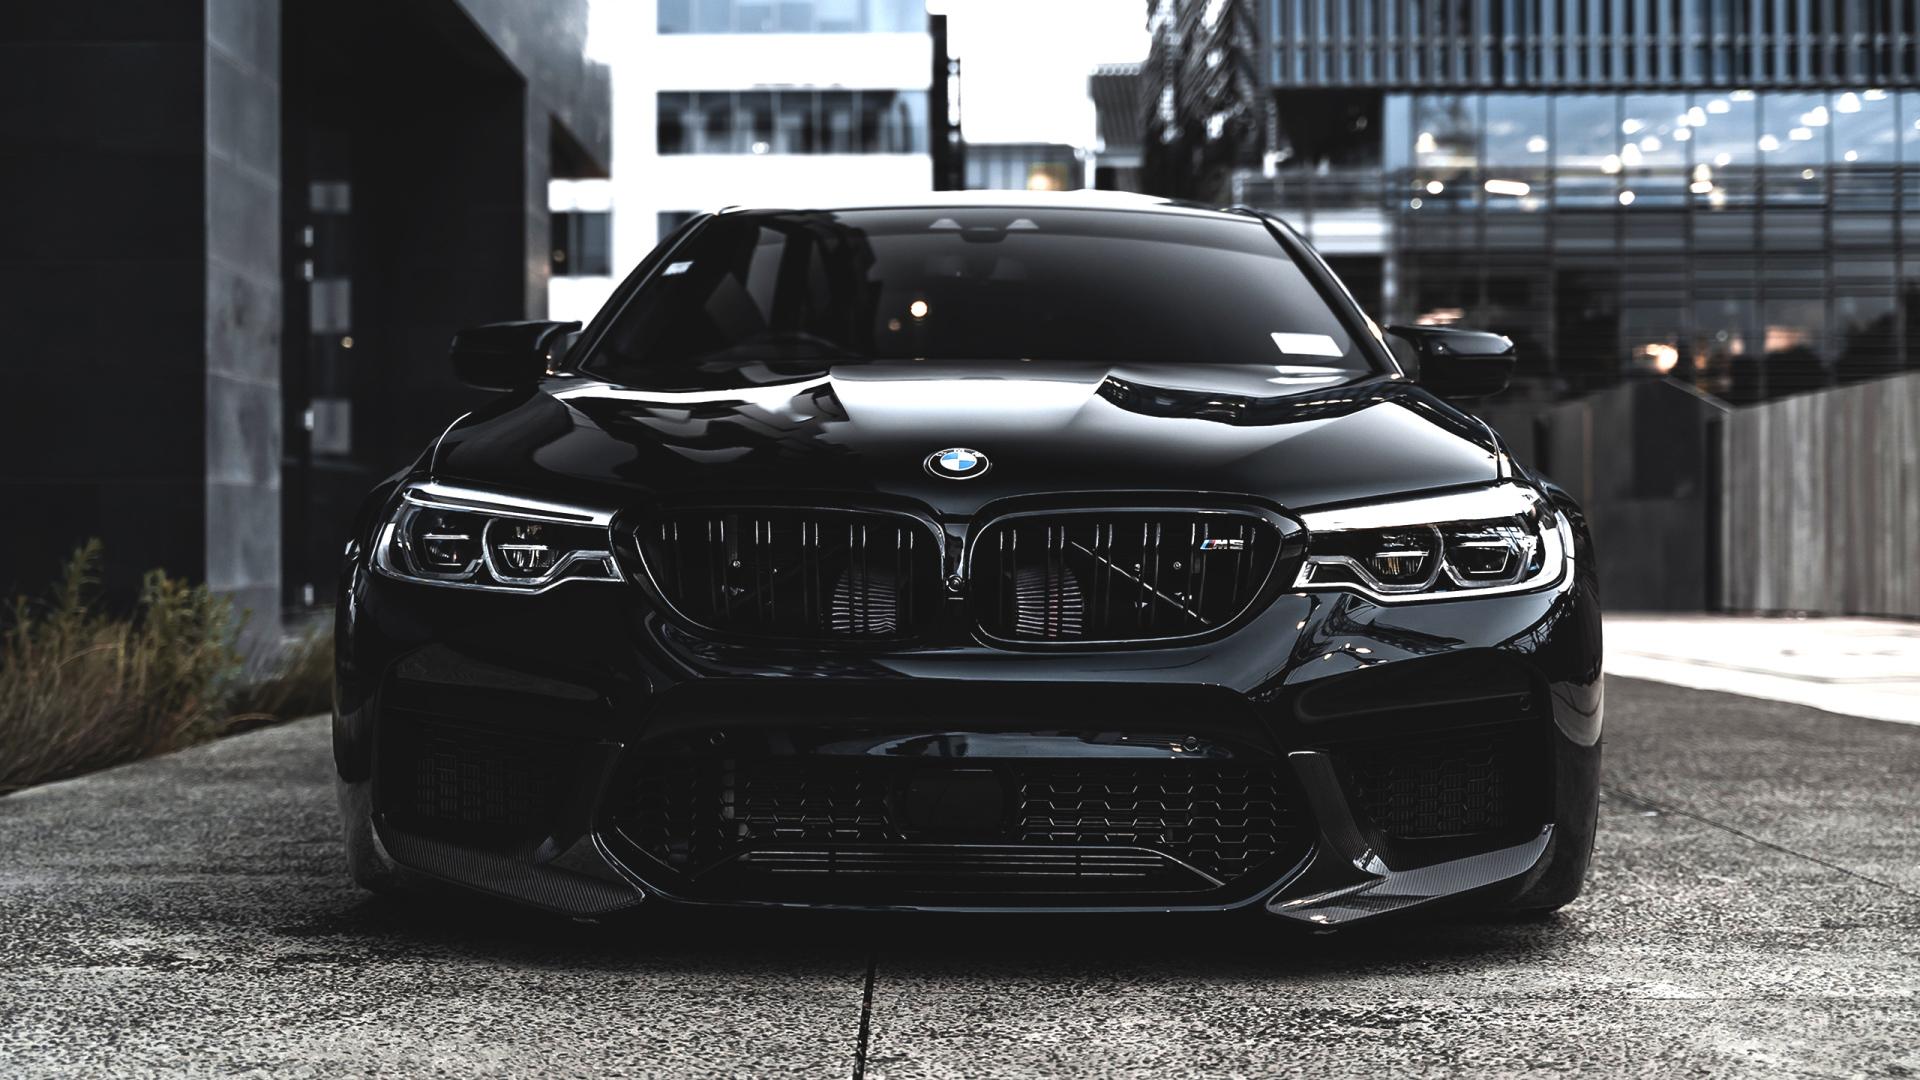 Stylish black BMW M5 in the street